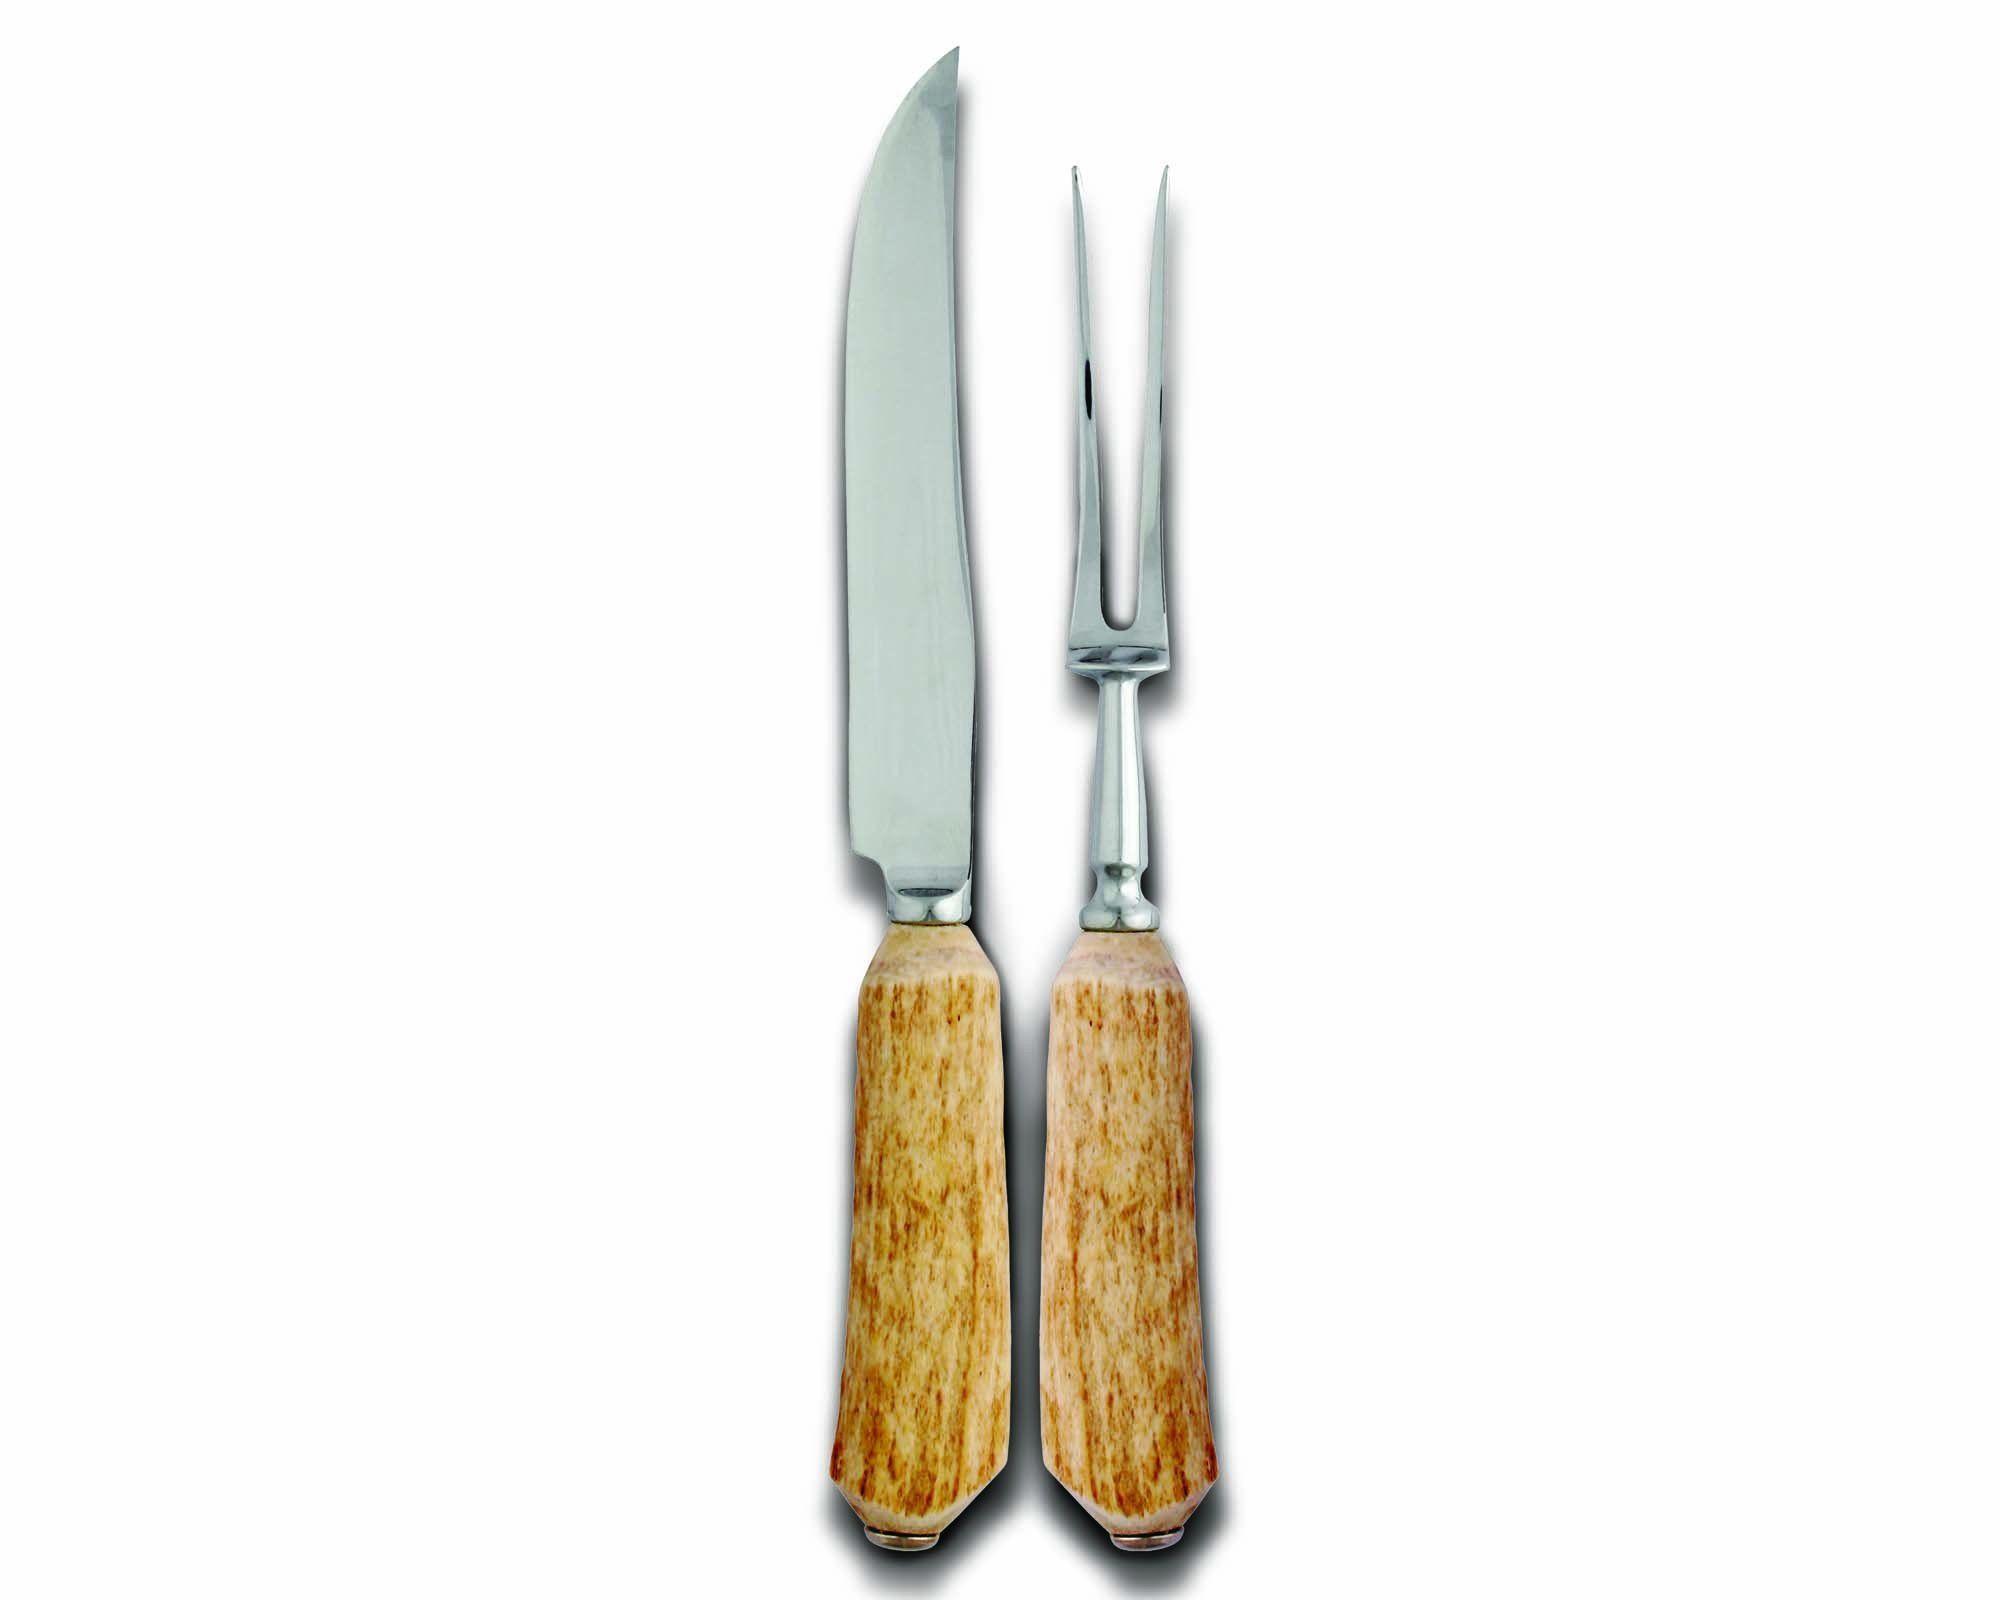 Natural Antler Carving Set Large Size Products Pinterest